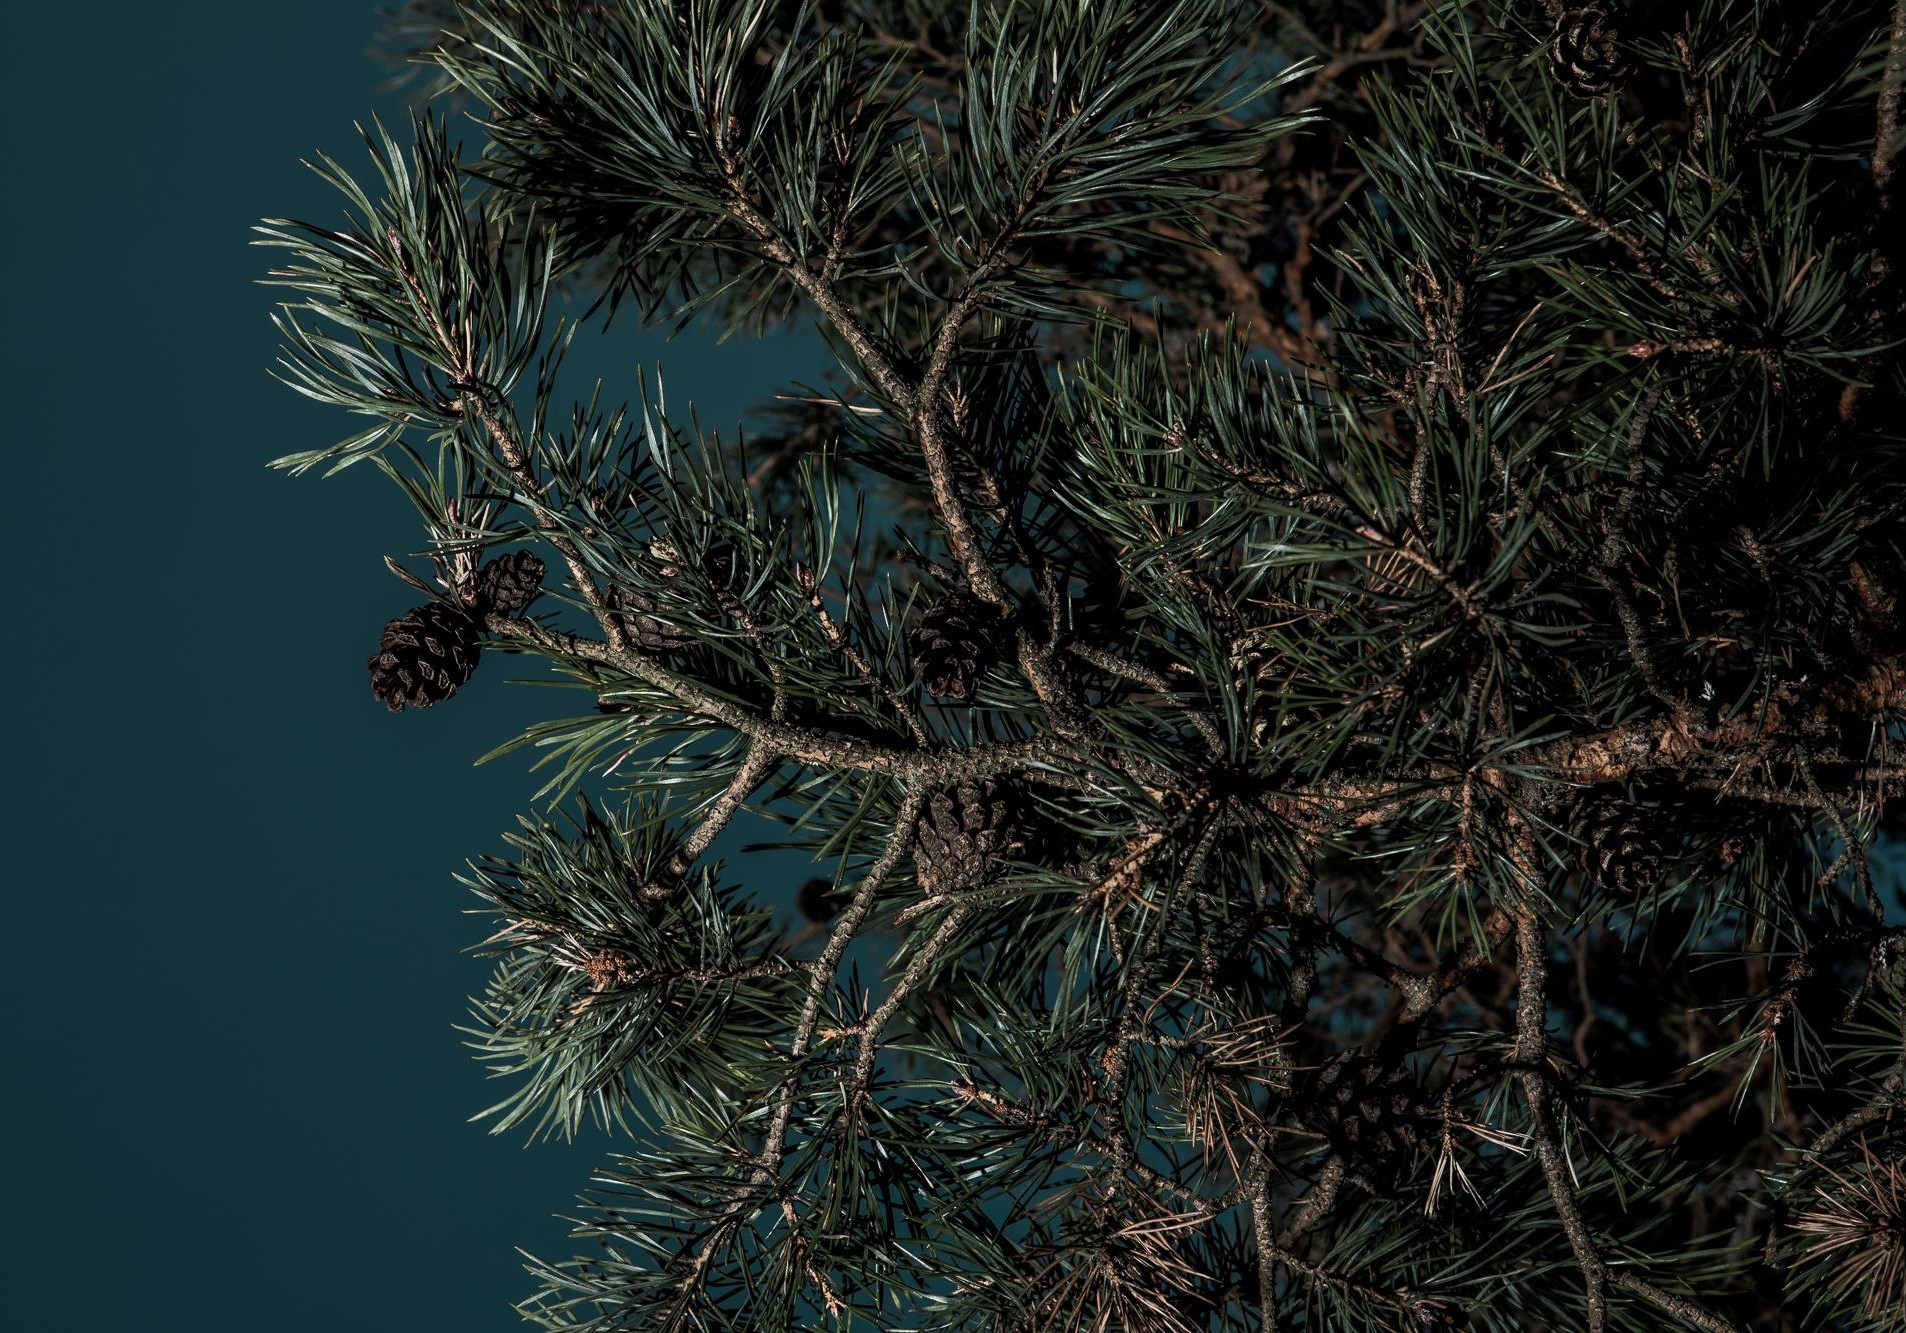 DNA Cone Pine tree